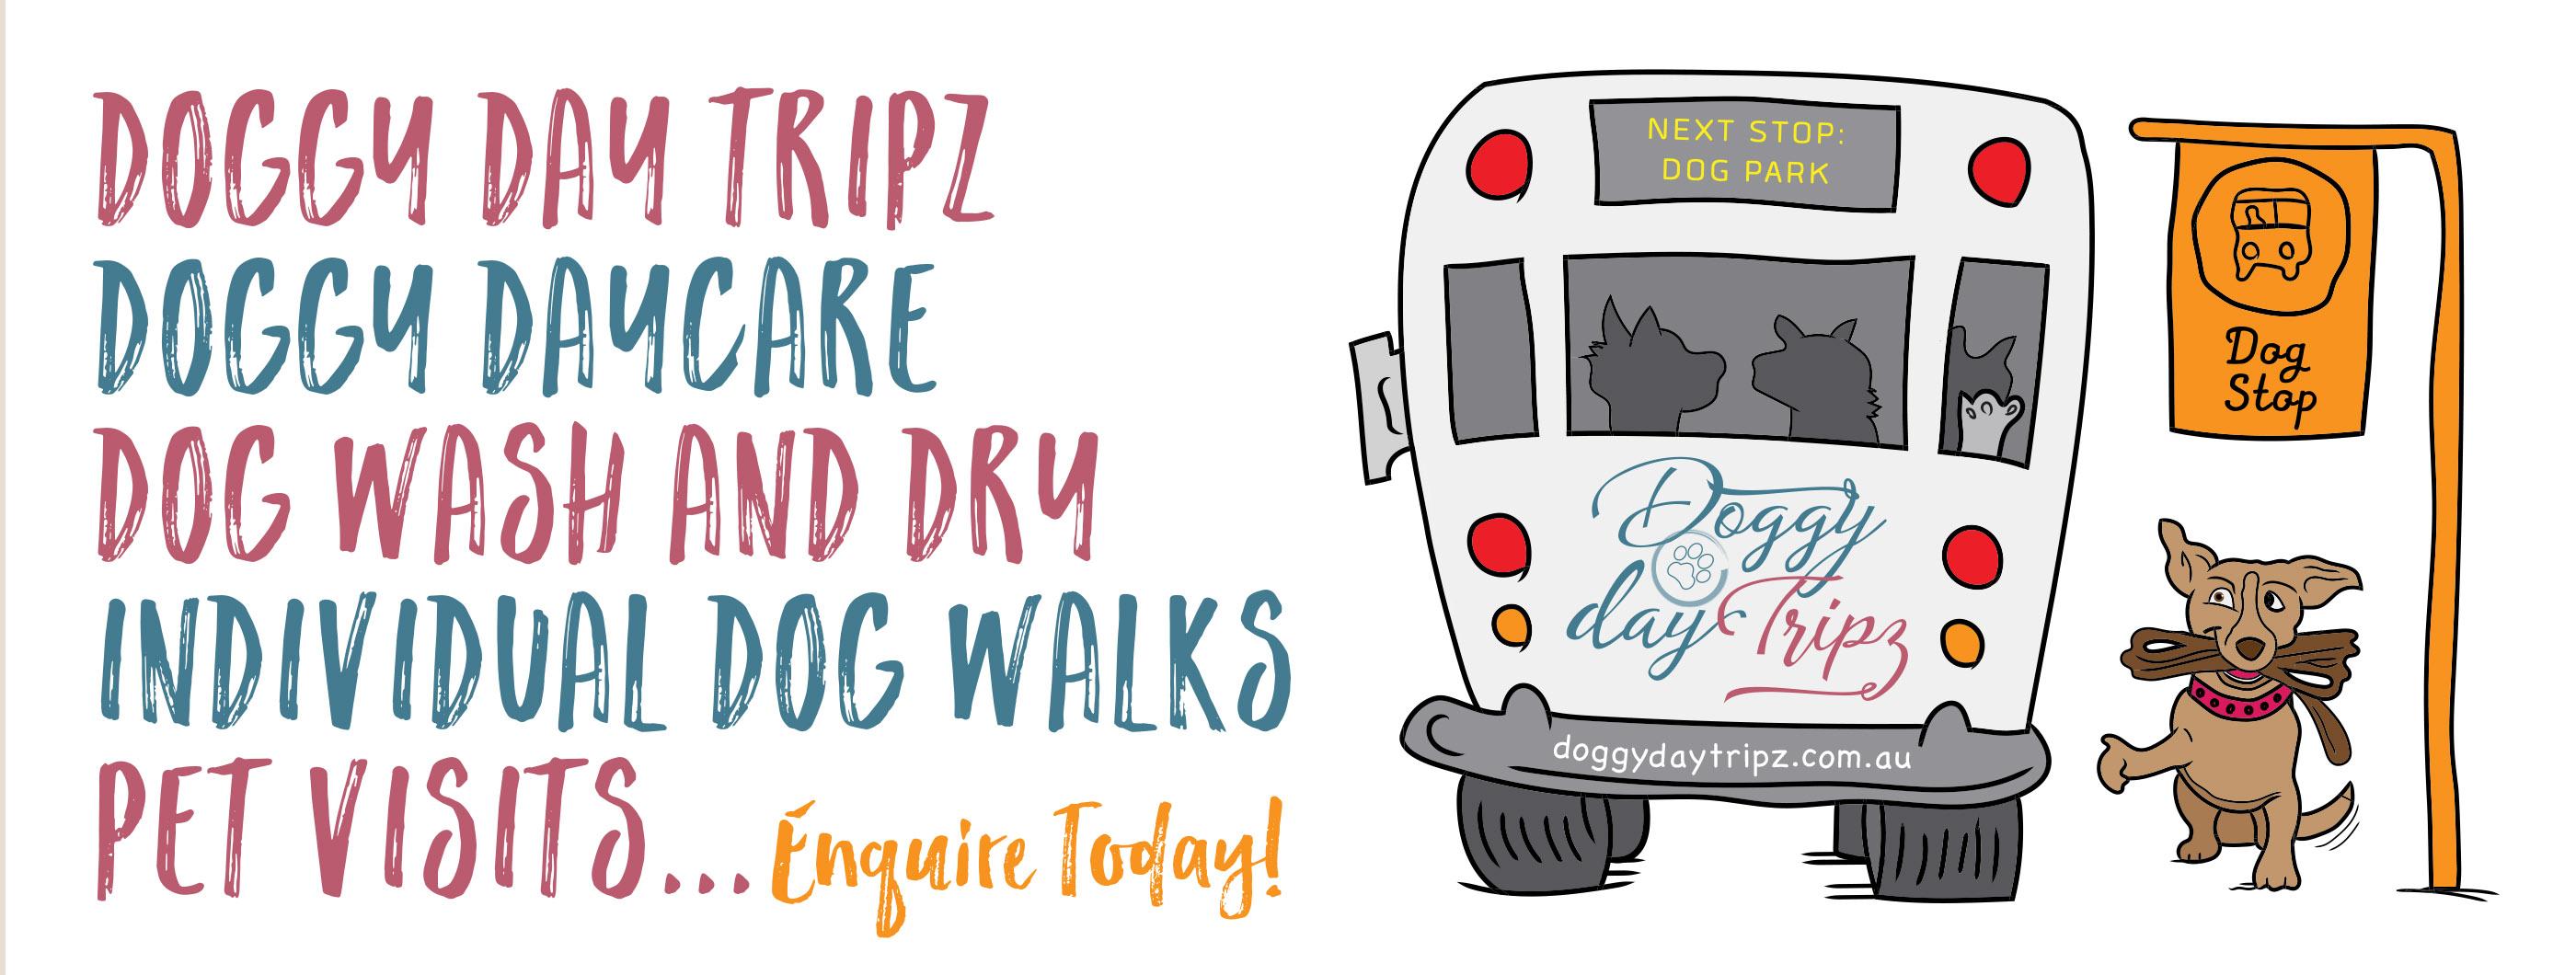 Doggy Day Tripz facebook banner idea